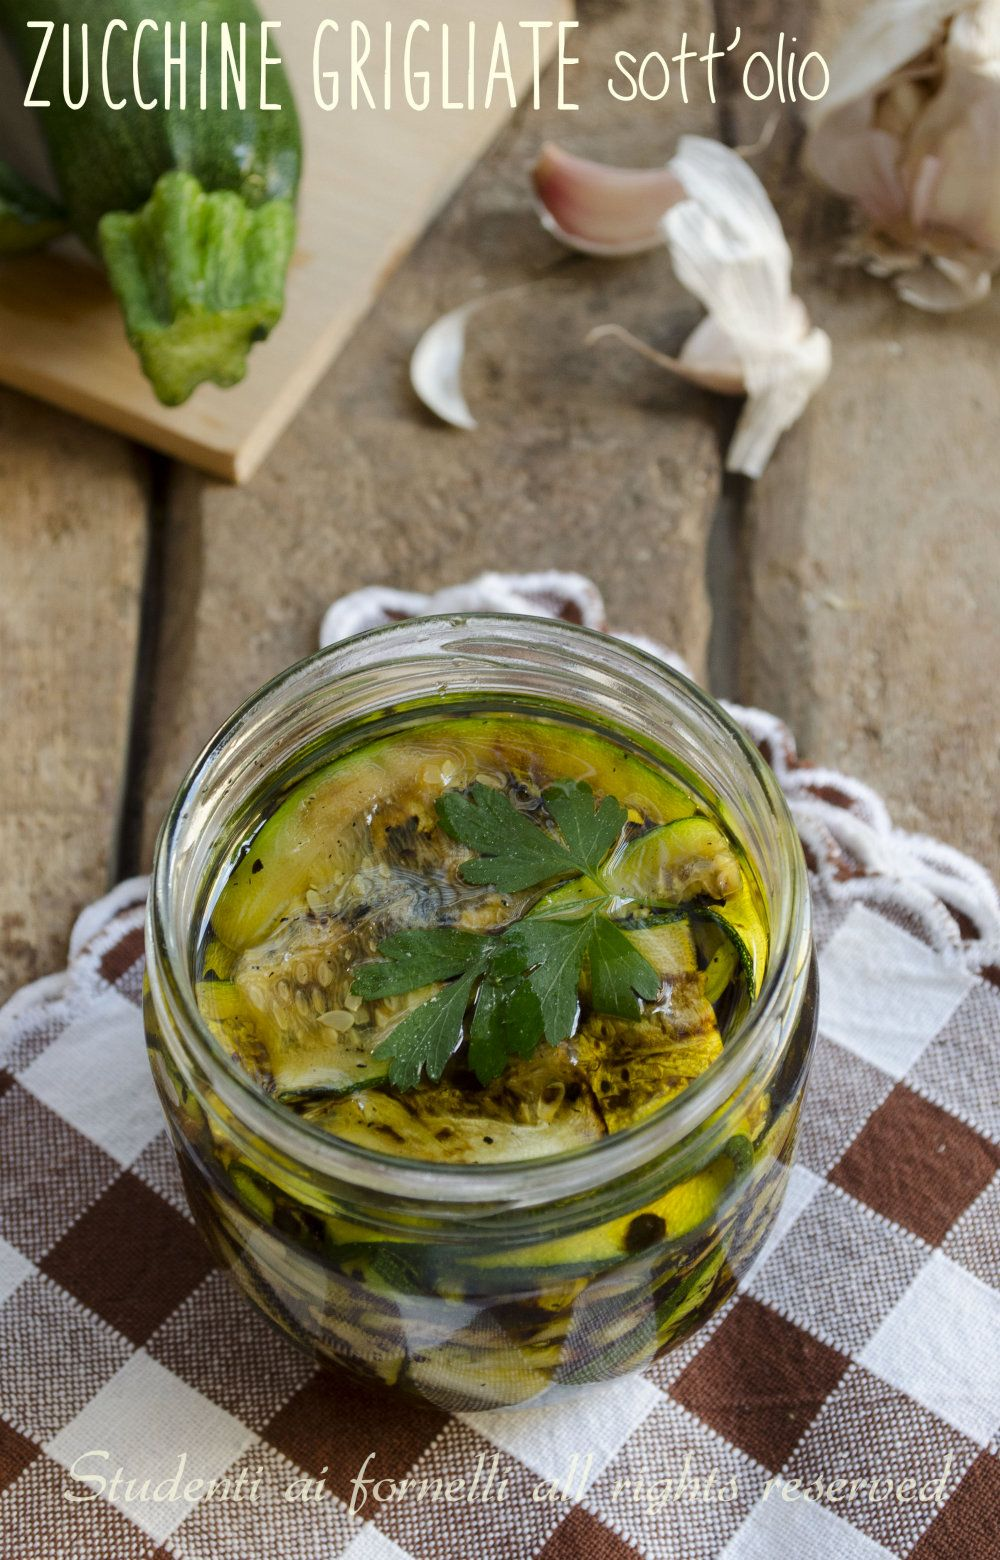 Zucchine grigliate sott'olio, ricetta conserva di zucchine